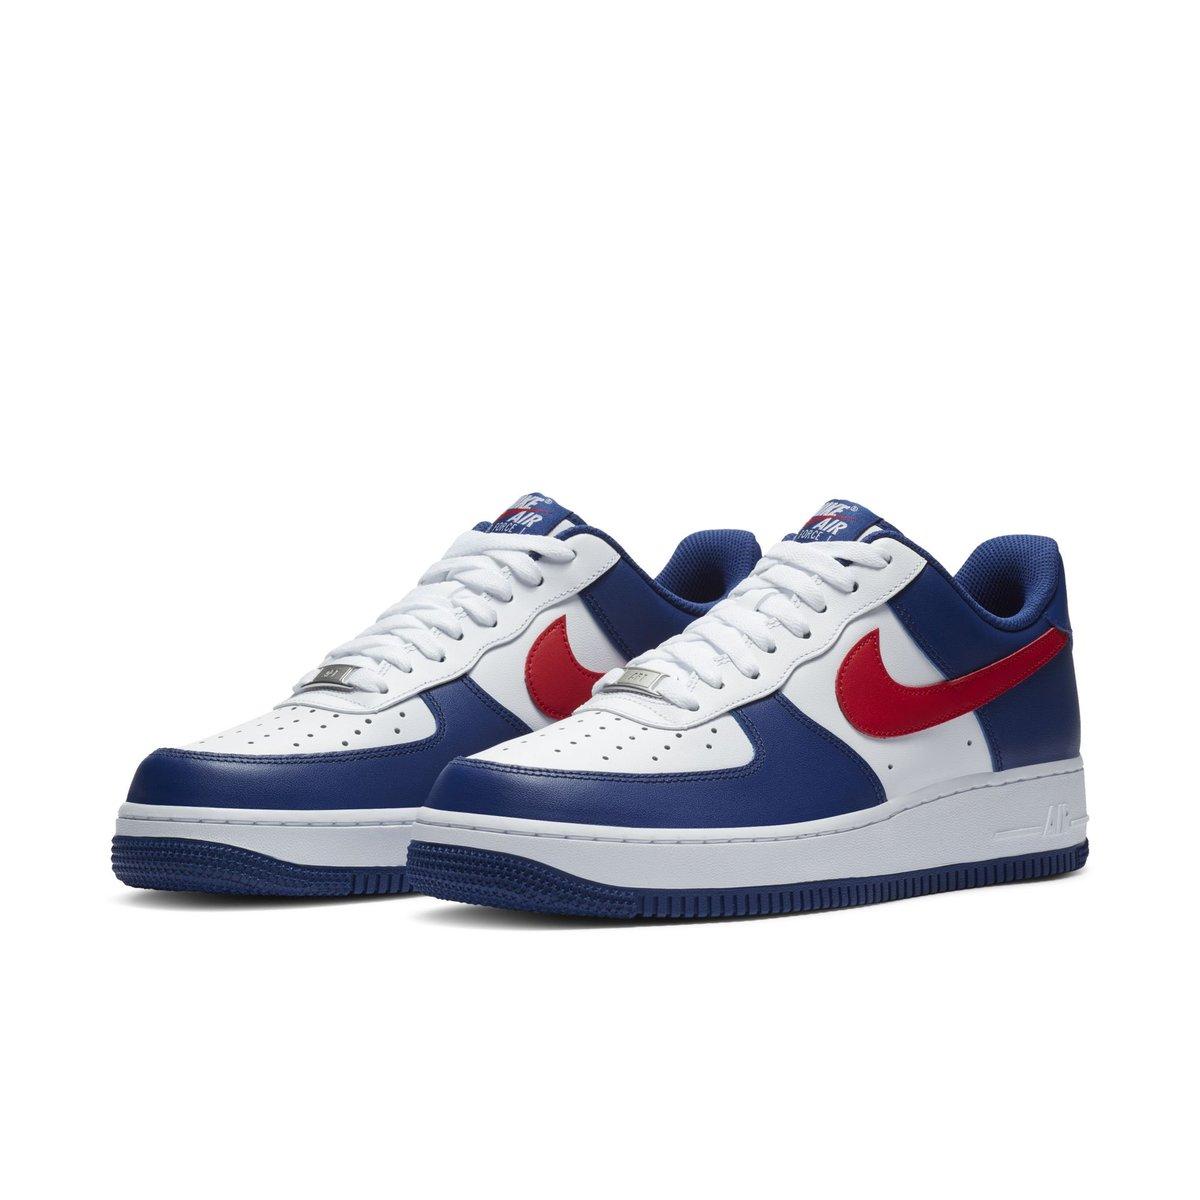 Nike Air Force 1 Low LV8 'Americana